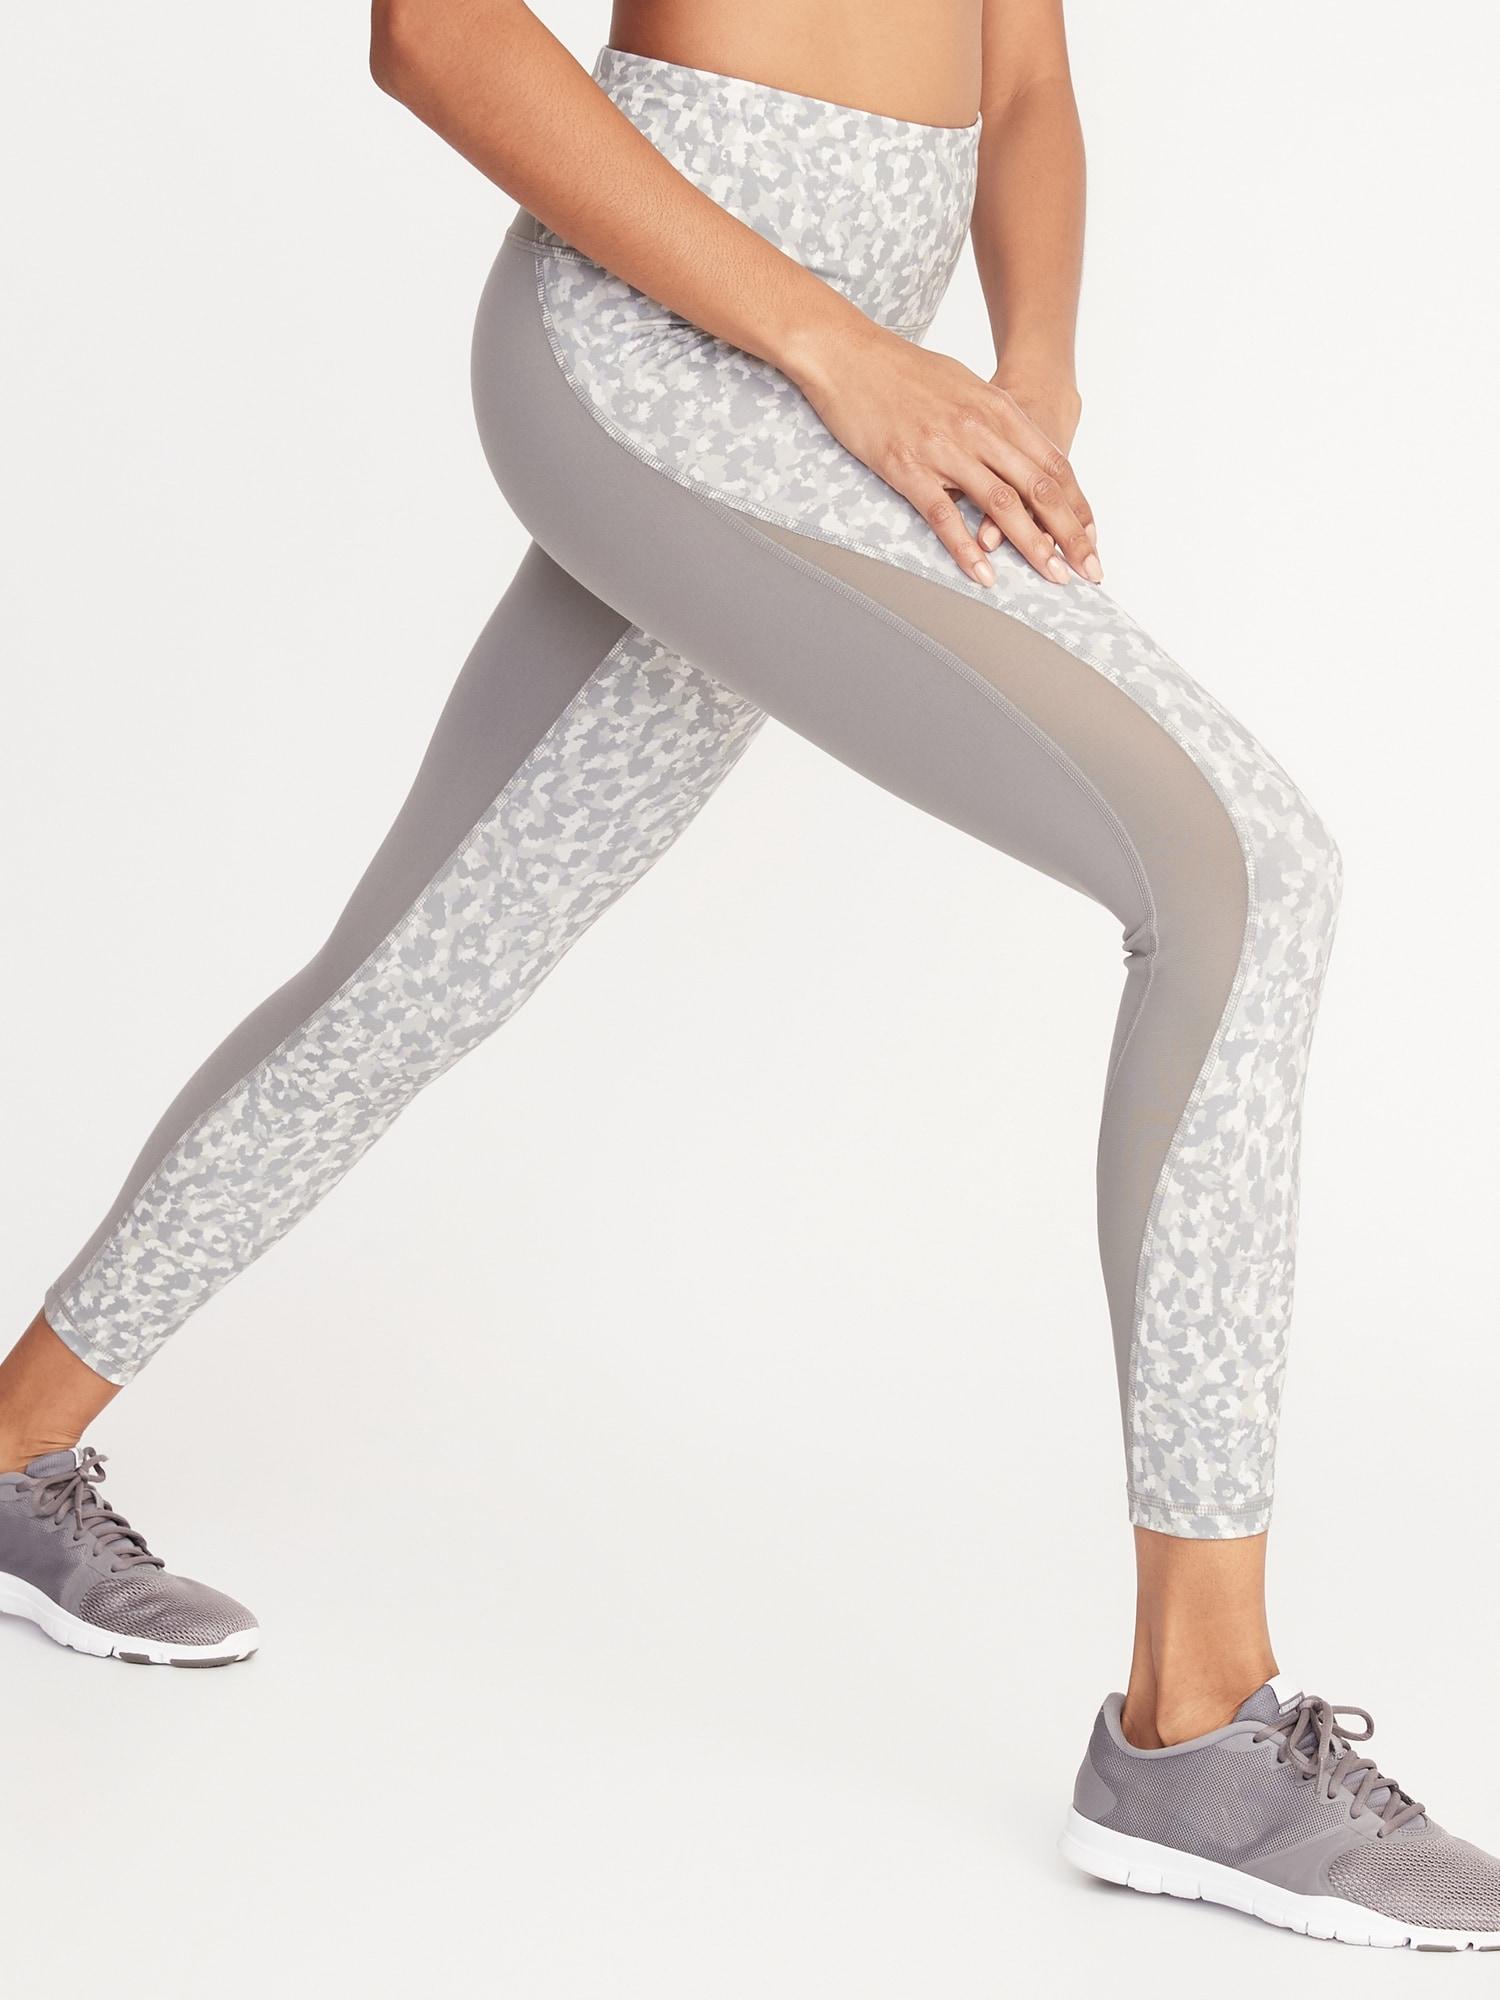 969a5c3db1 High-Rise Elevate 7/8-Length Mesh-Trim Compression Leggings for Women